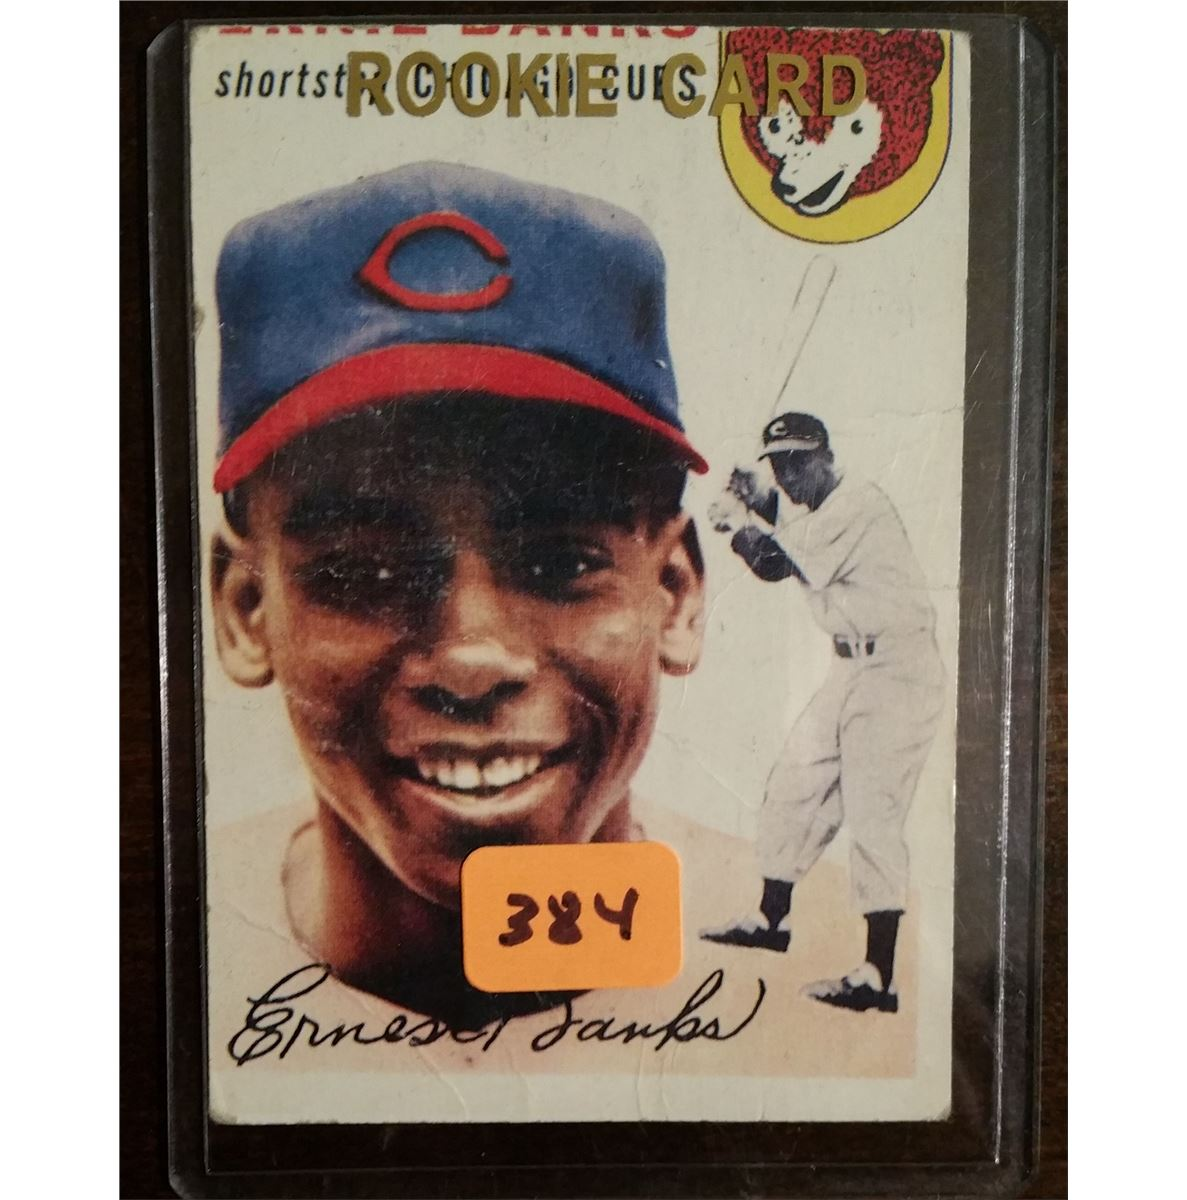 1954 Topps Ernie Banks Rookie Card 94